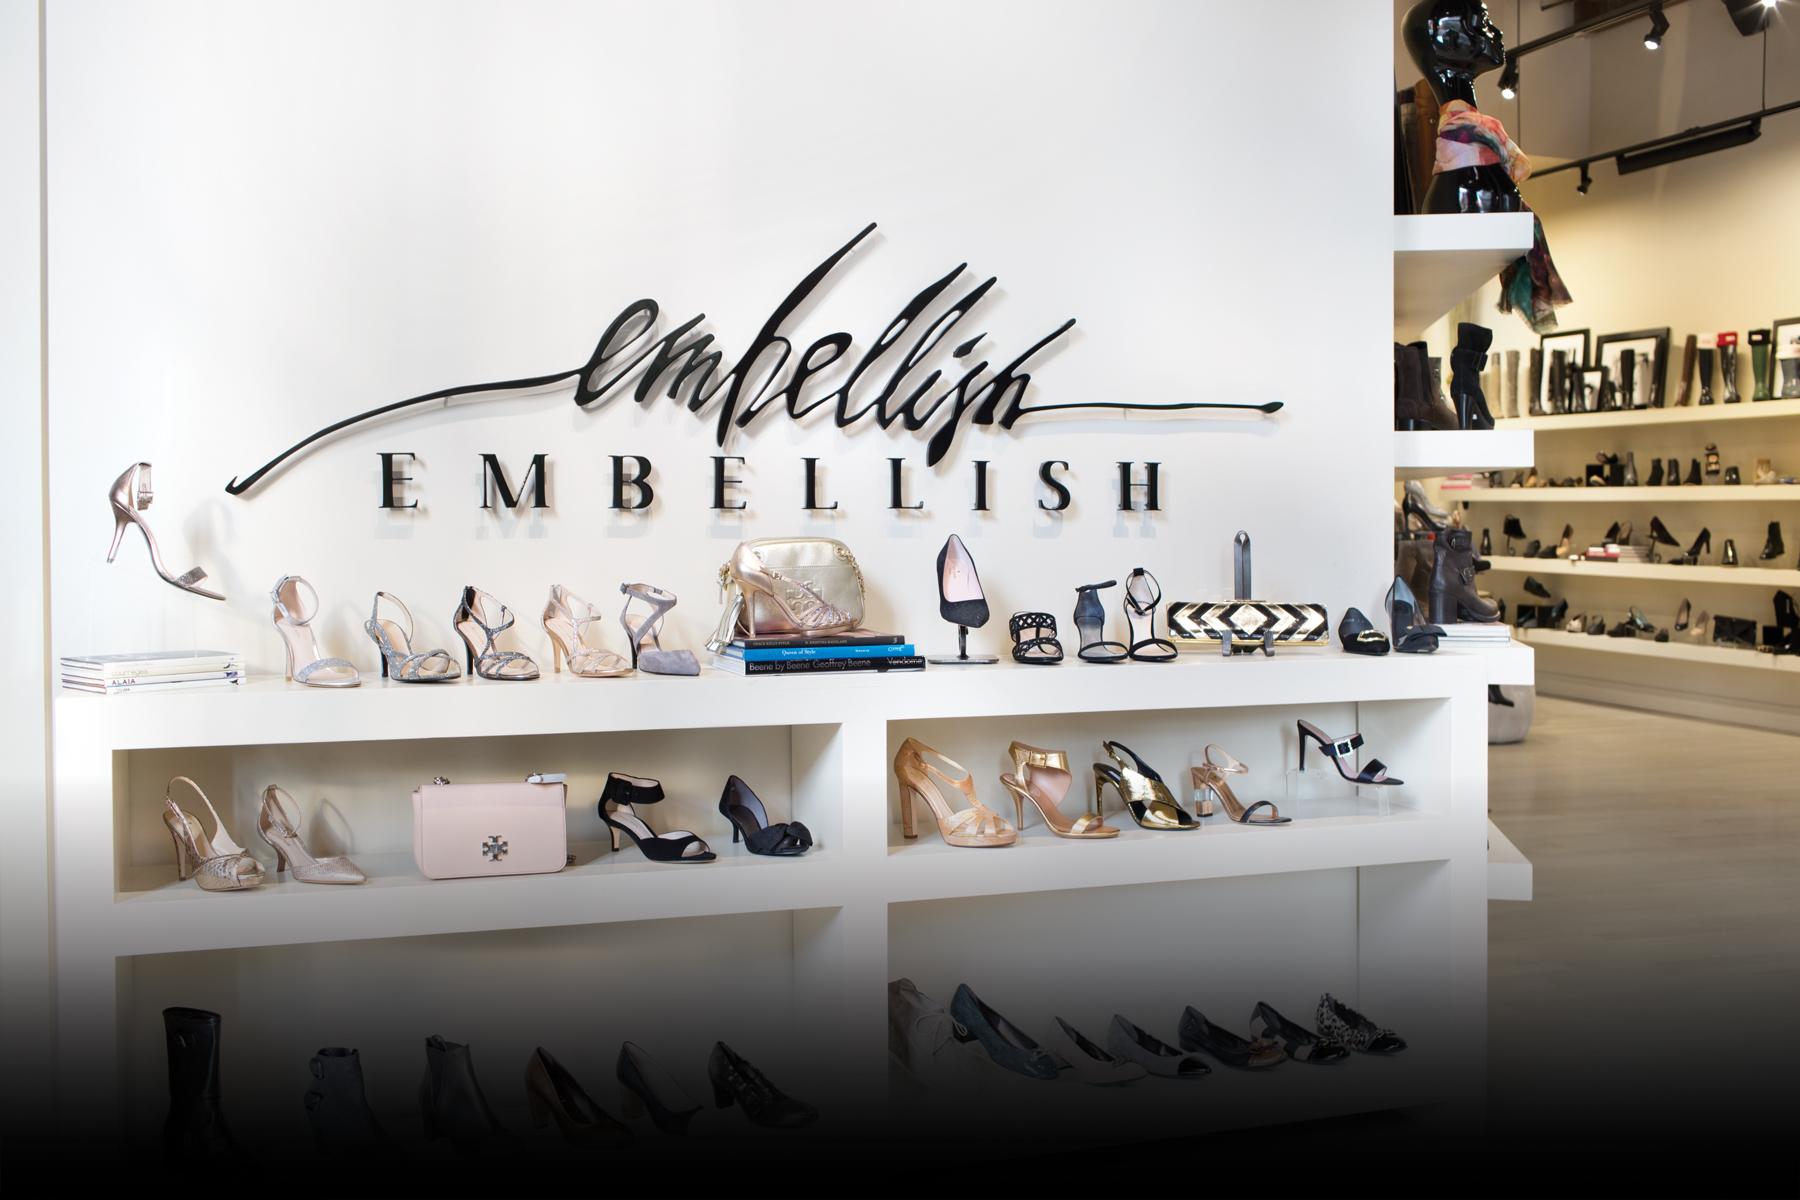 Embellish-1.jpg